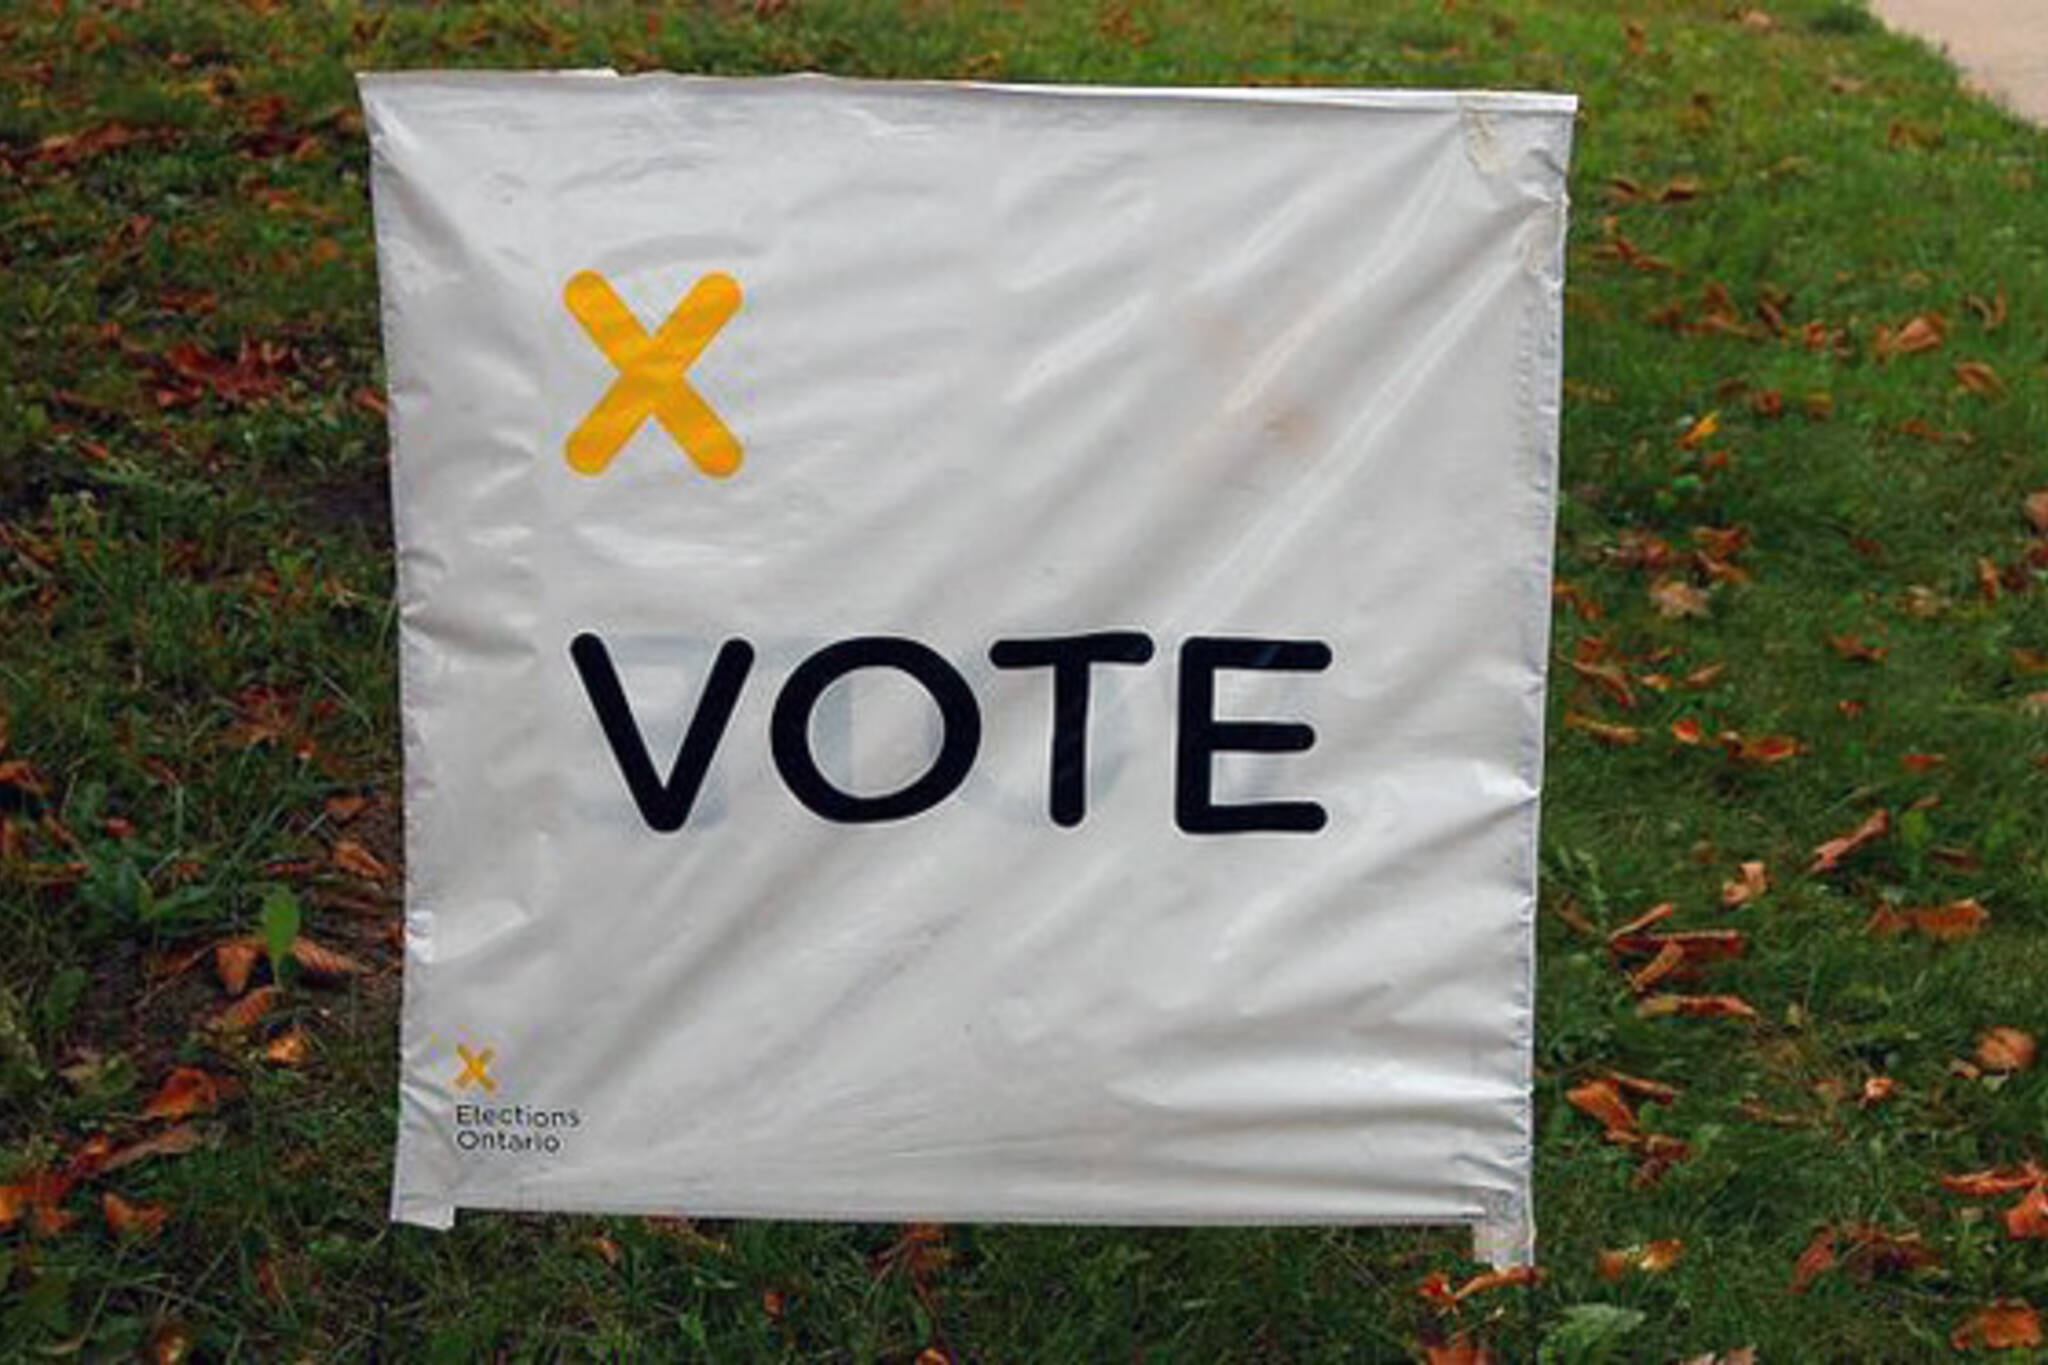 Ontario Provincial Election Results 2011